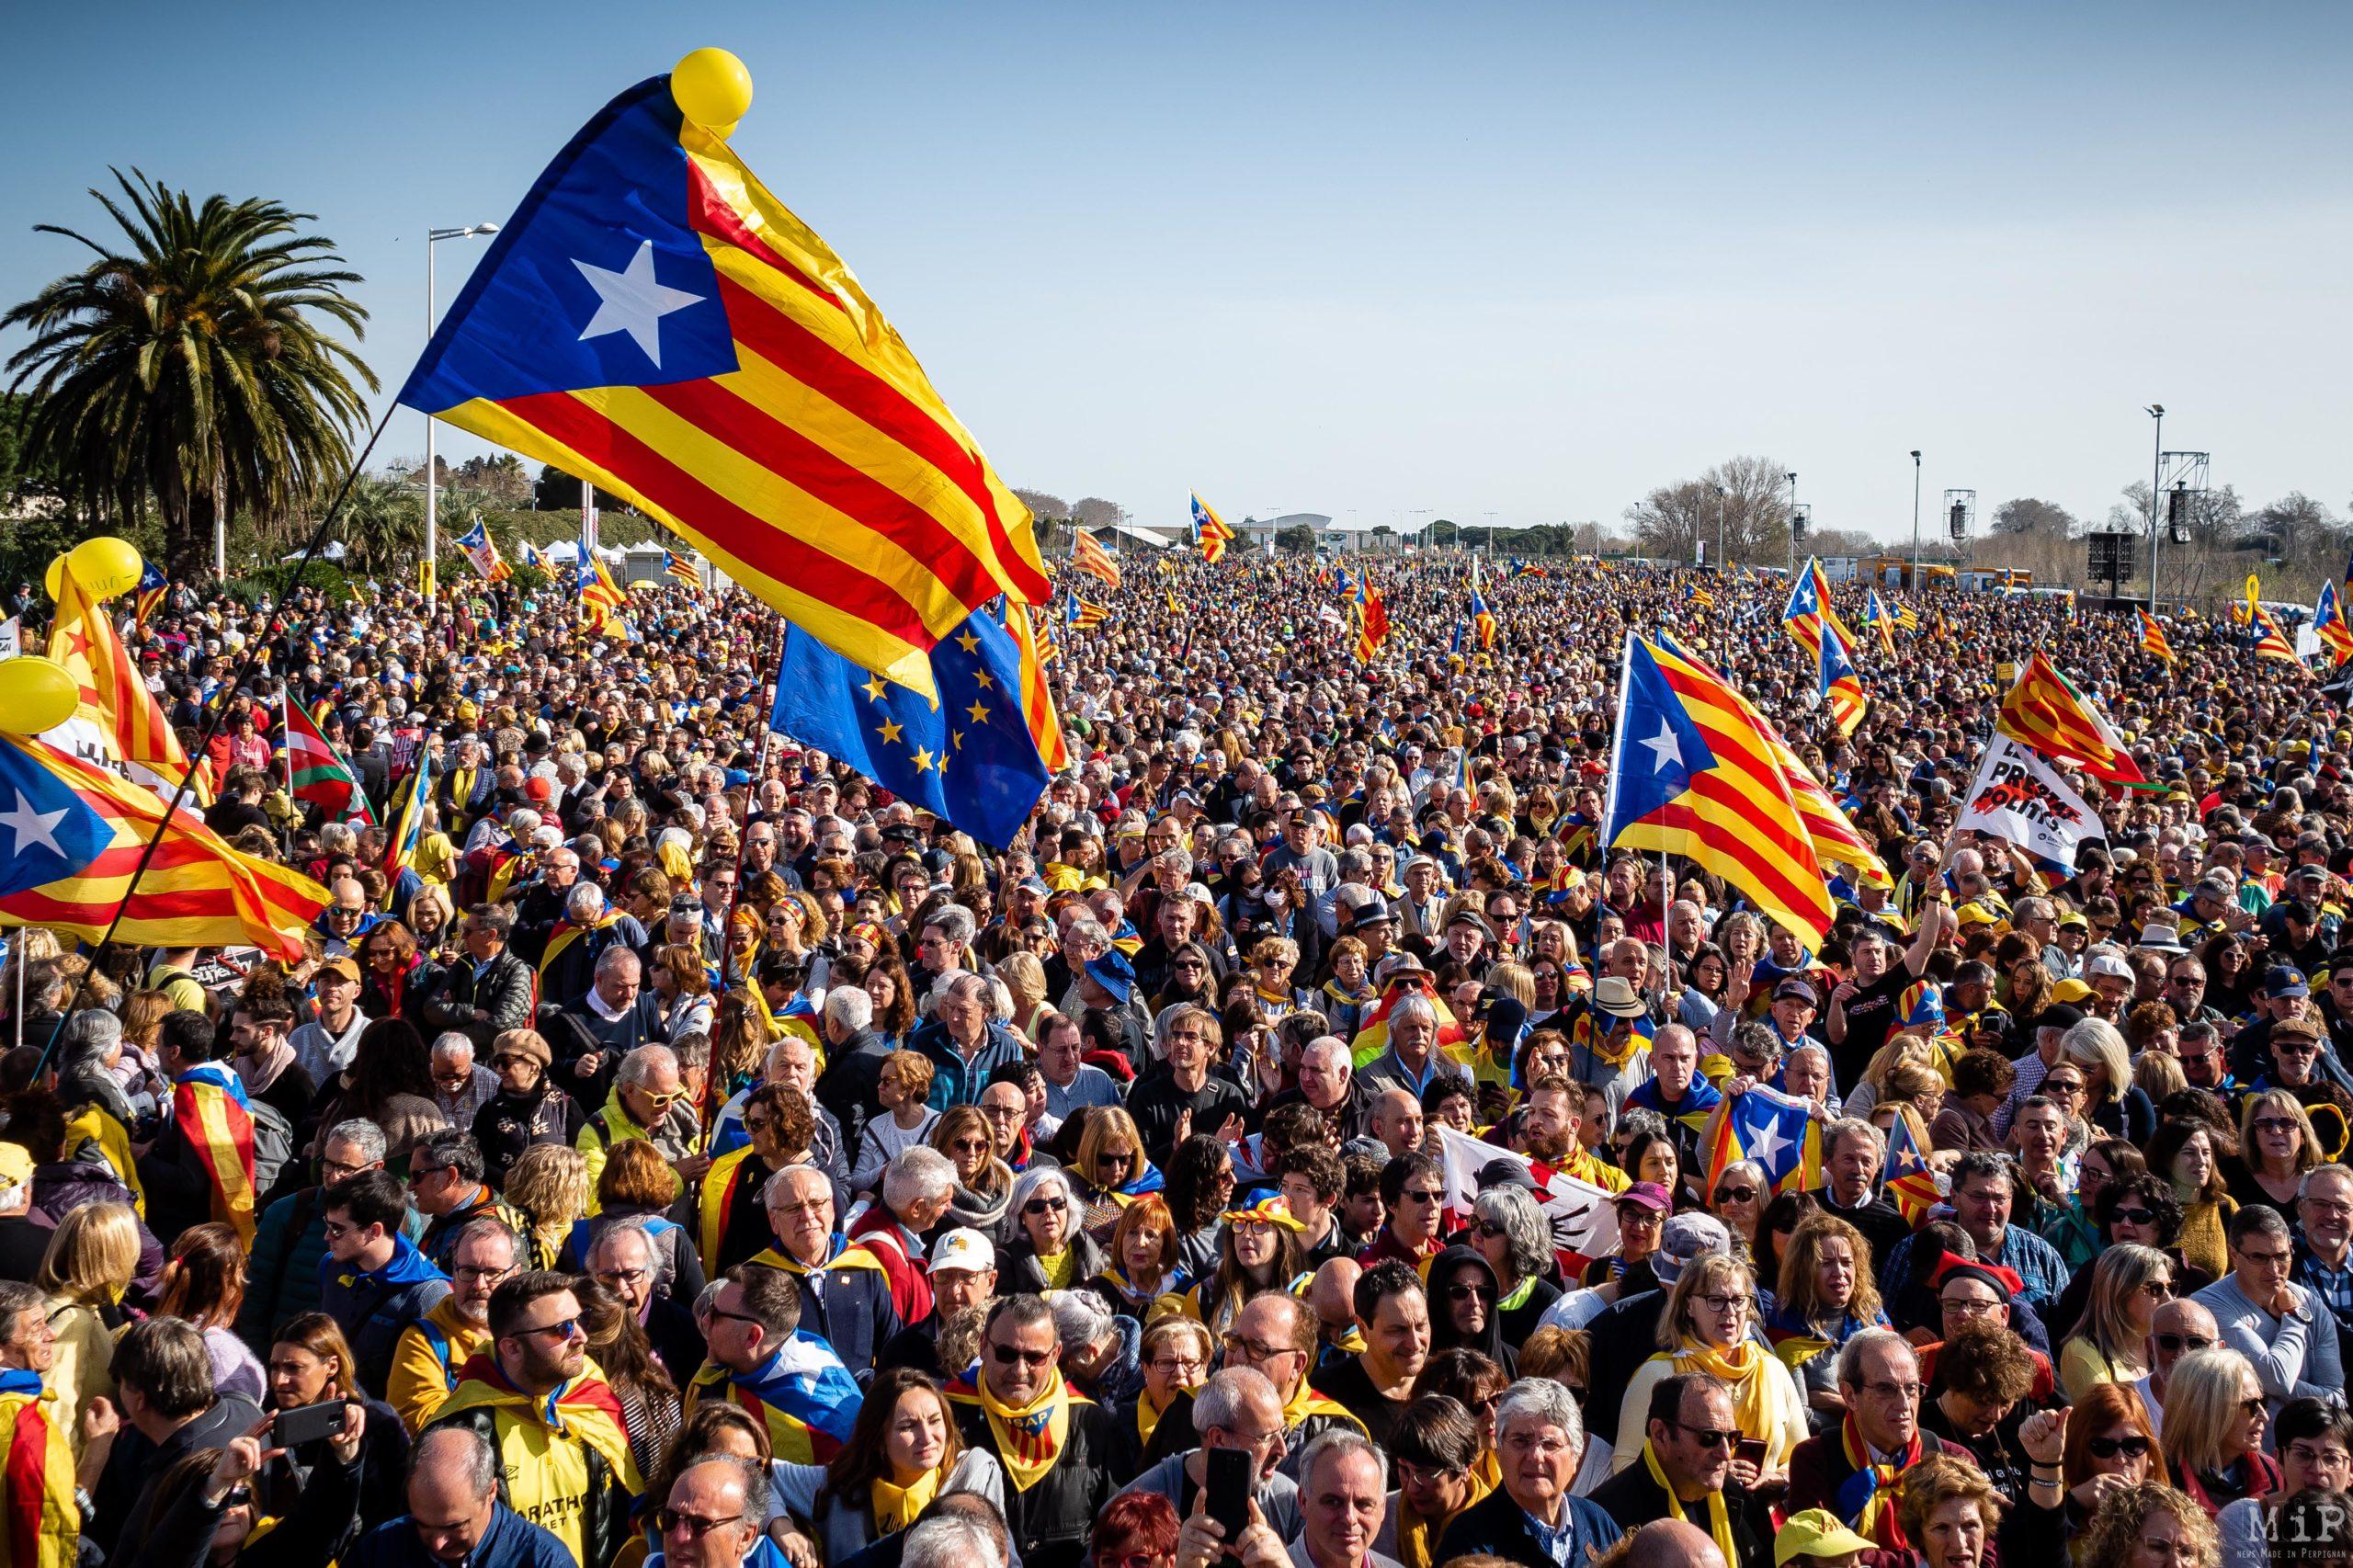 Carles Puigdemont meeting Perpignan Perpinya Catalogne Catalonia Catalunya Catalan independence independencia drapeau flag presos politics Consell per la Republica catalana manifestation llibertat © Arnaud Le Vu / MiP / APM